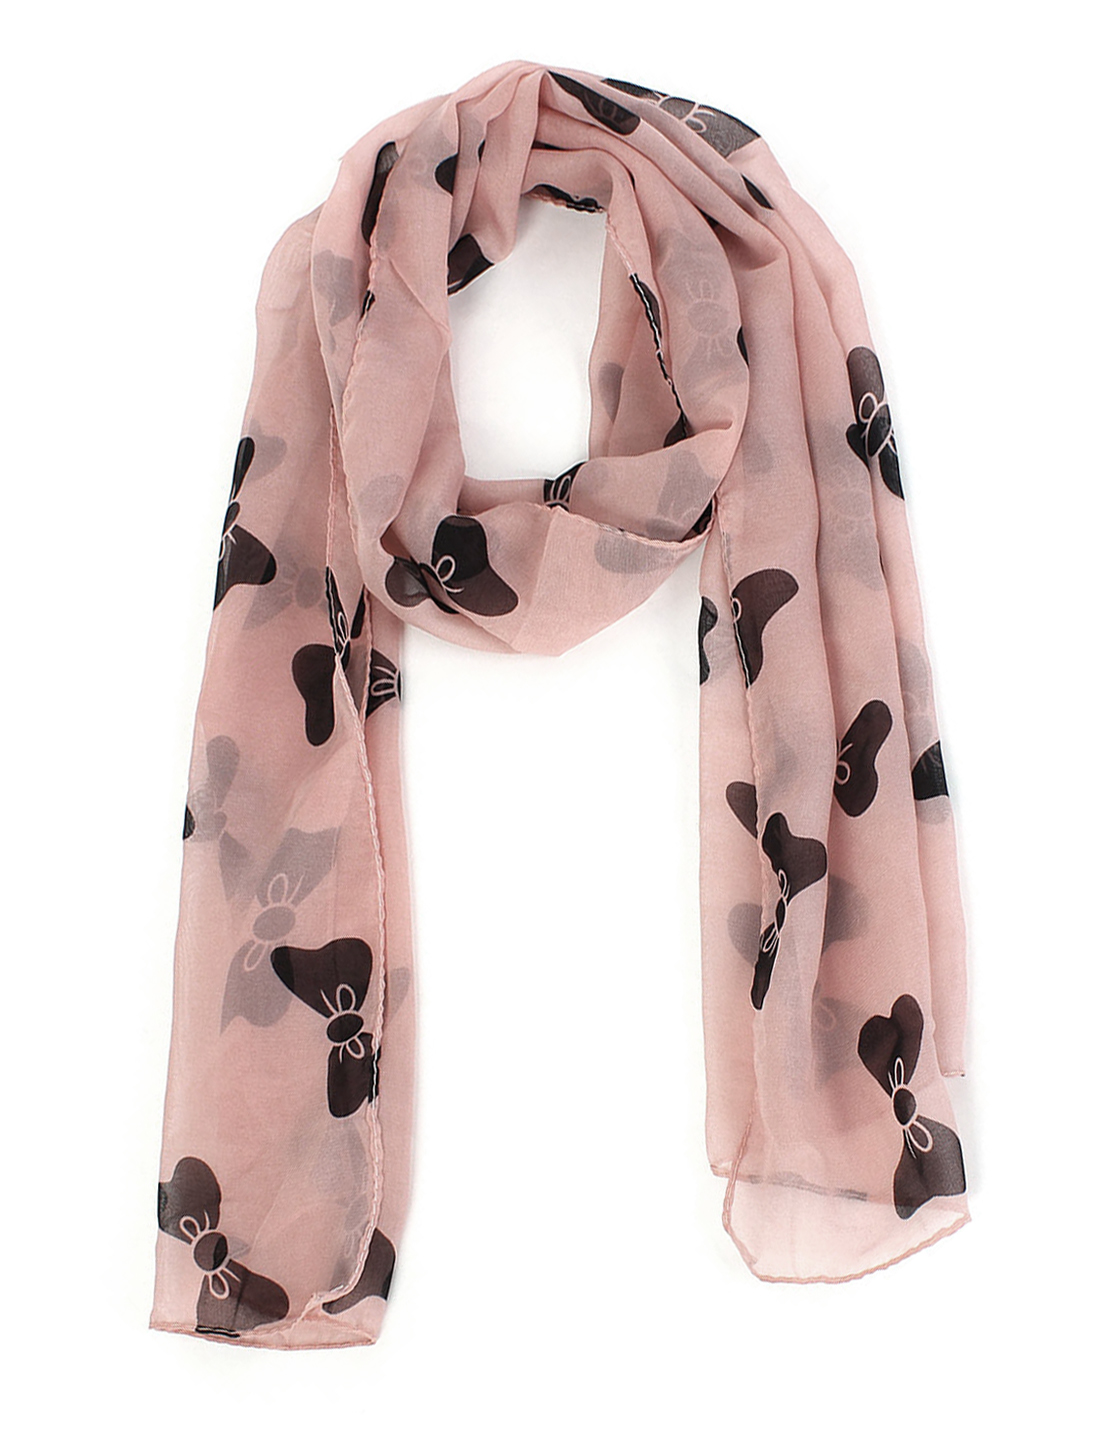 Girls Chiffon Bow-knot Print Dual-use Wrap Stole Shawl Scarf Coral Pink